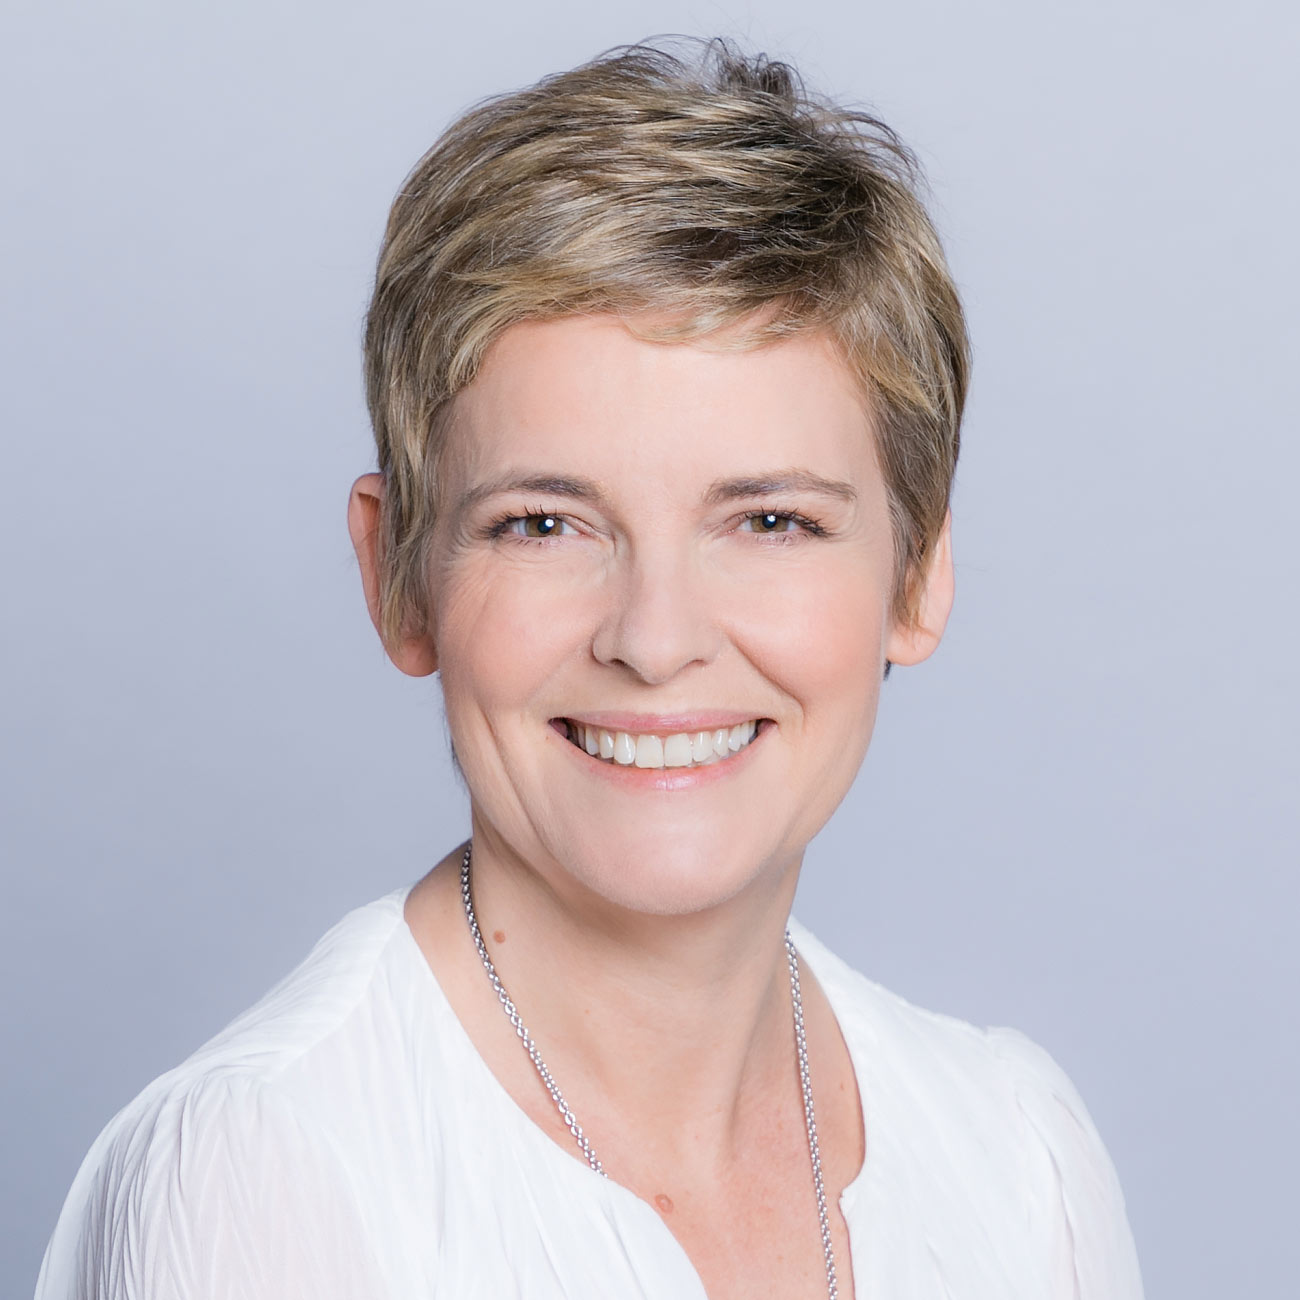 Sabine Zanella, coach expérimentée de Via lecta